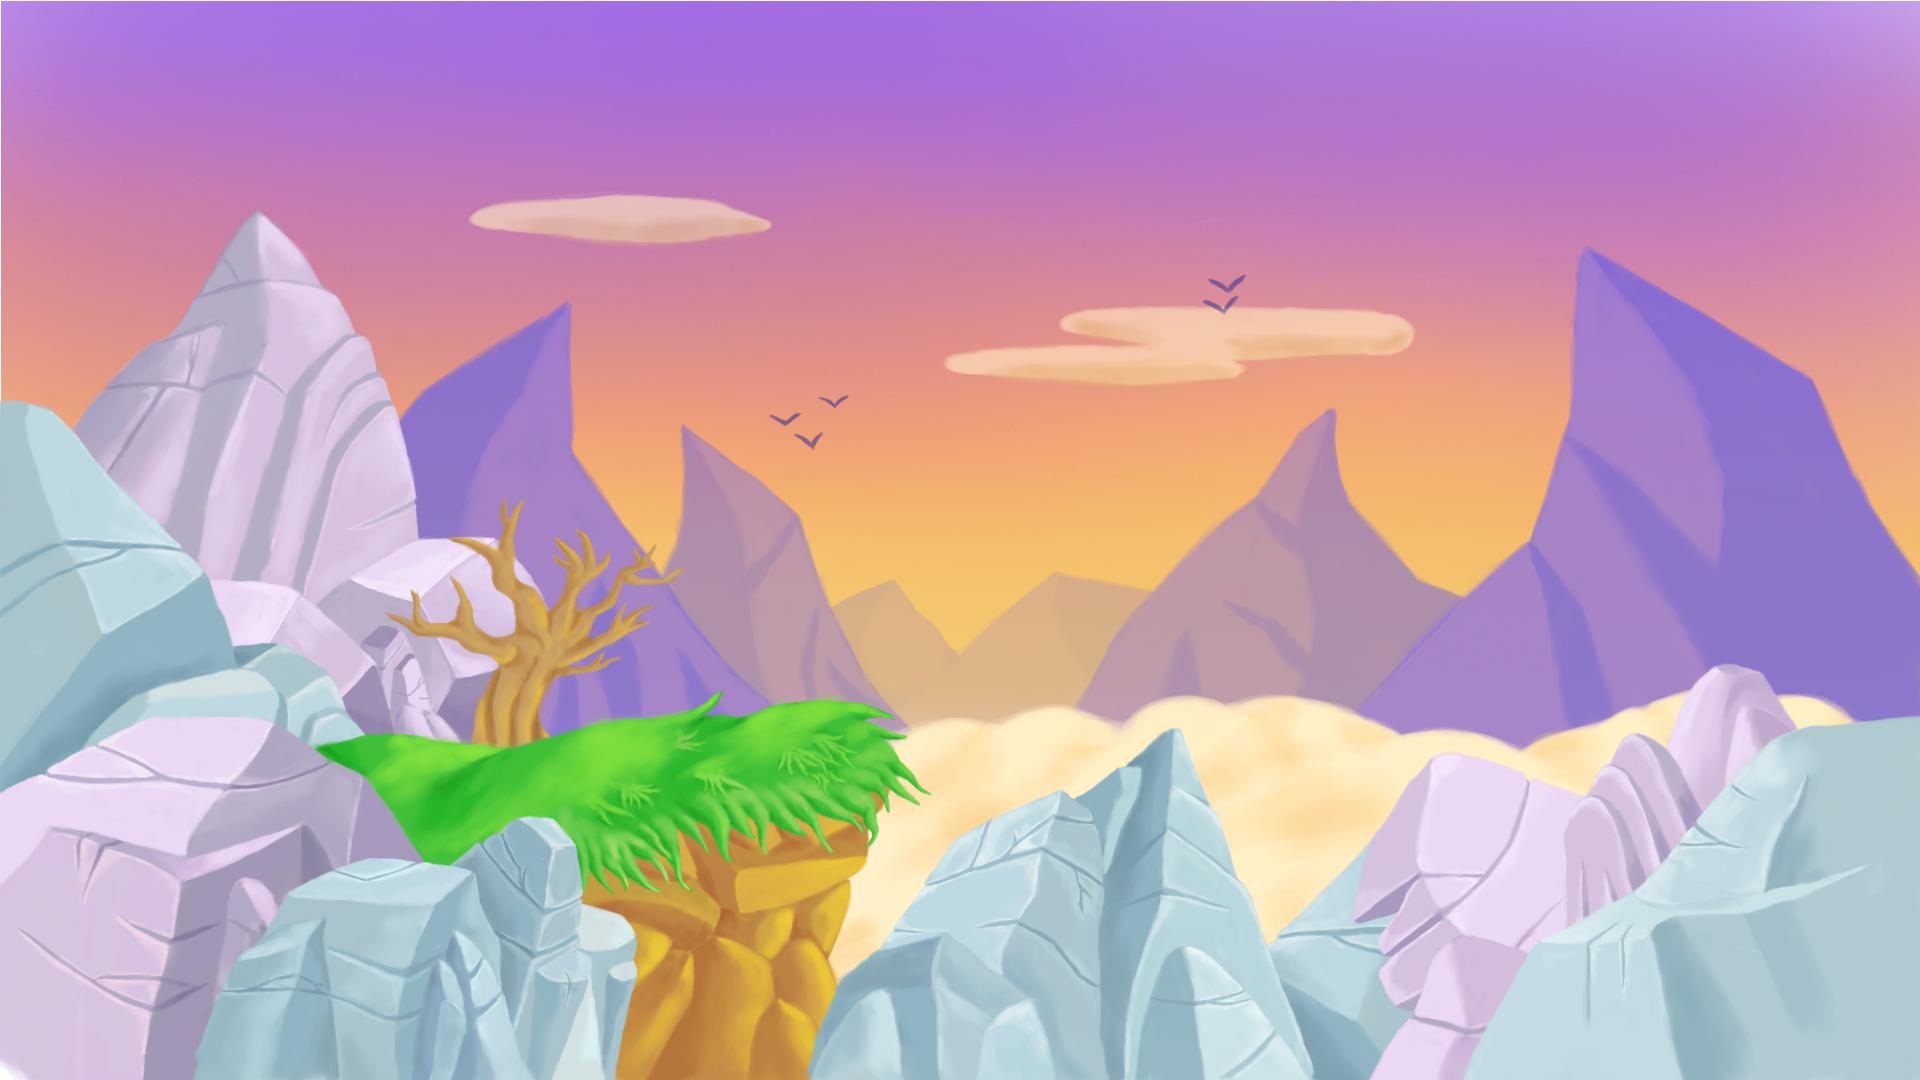 BackgroundMistypeak01